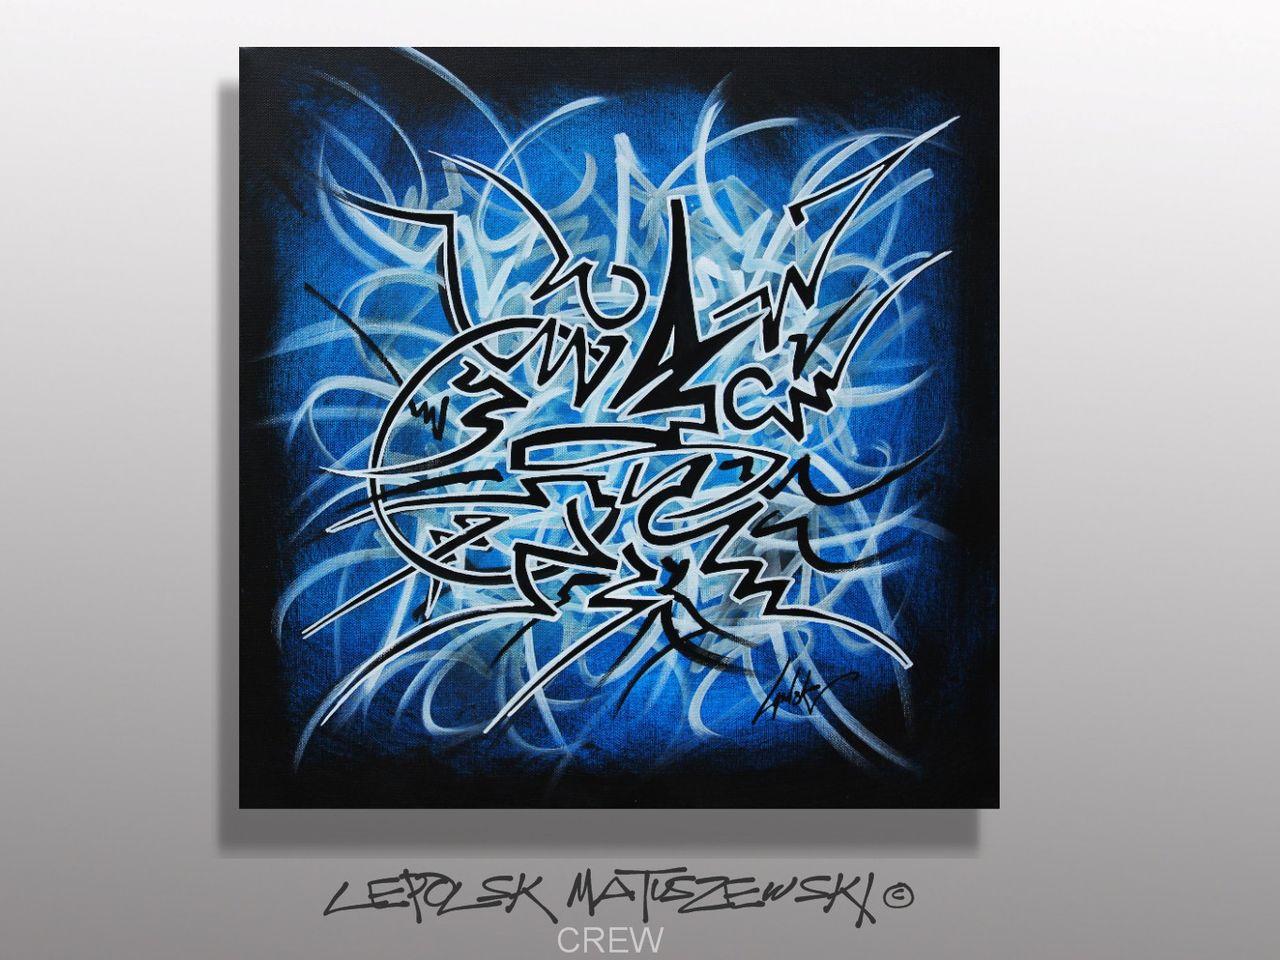 MISTER K  (Lepolsk Matuszewski) CREW   street art calligraffiti graffiti abstrait